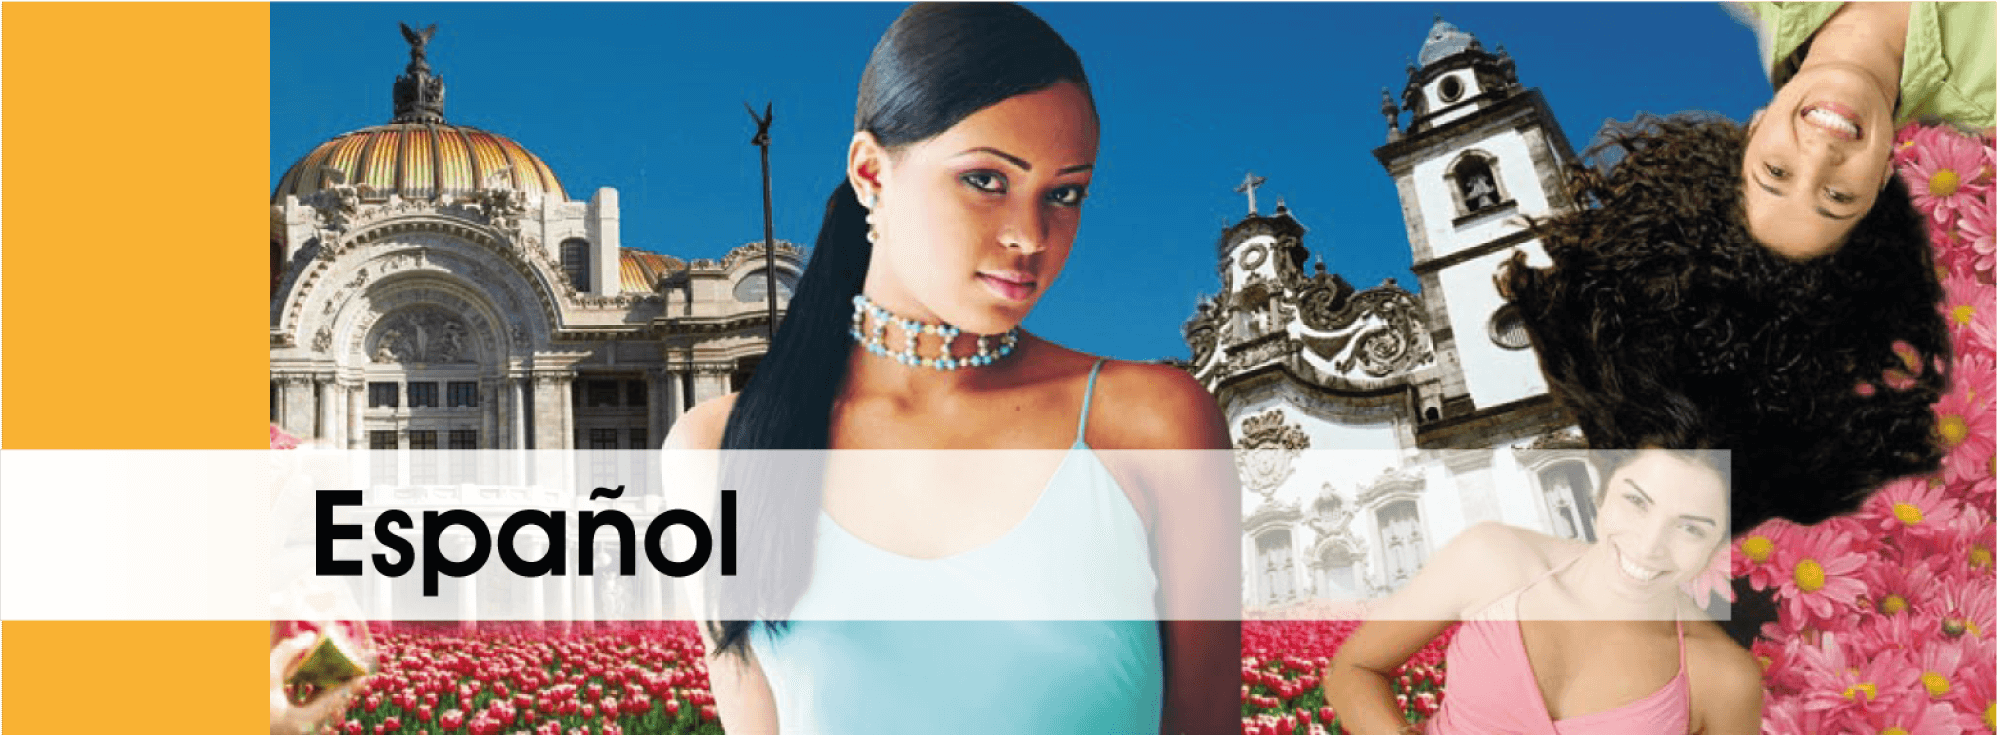 Curso Español Presencial, Curso Español Online, Curso de Idiomas